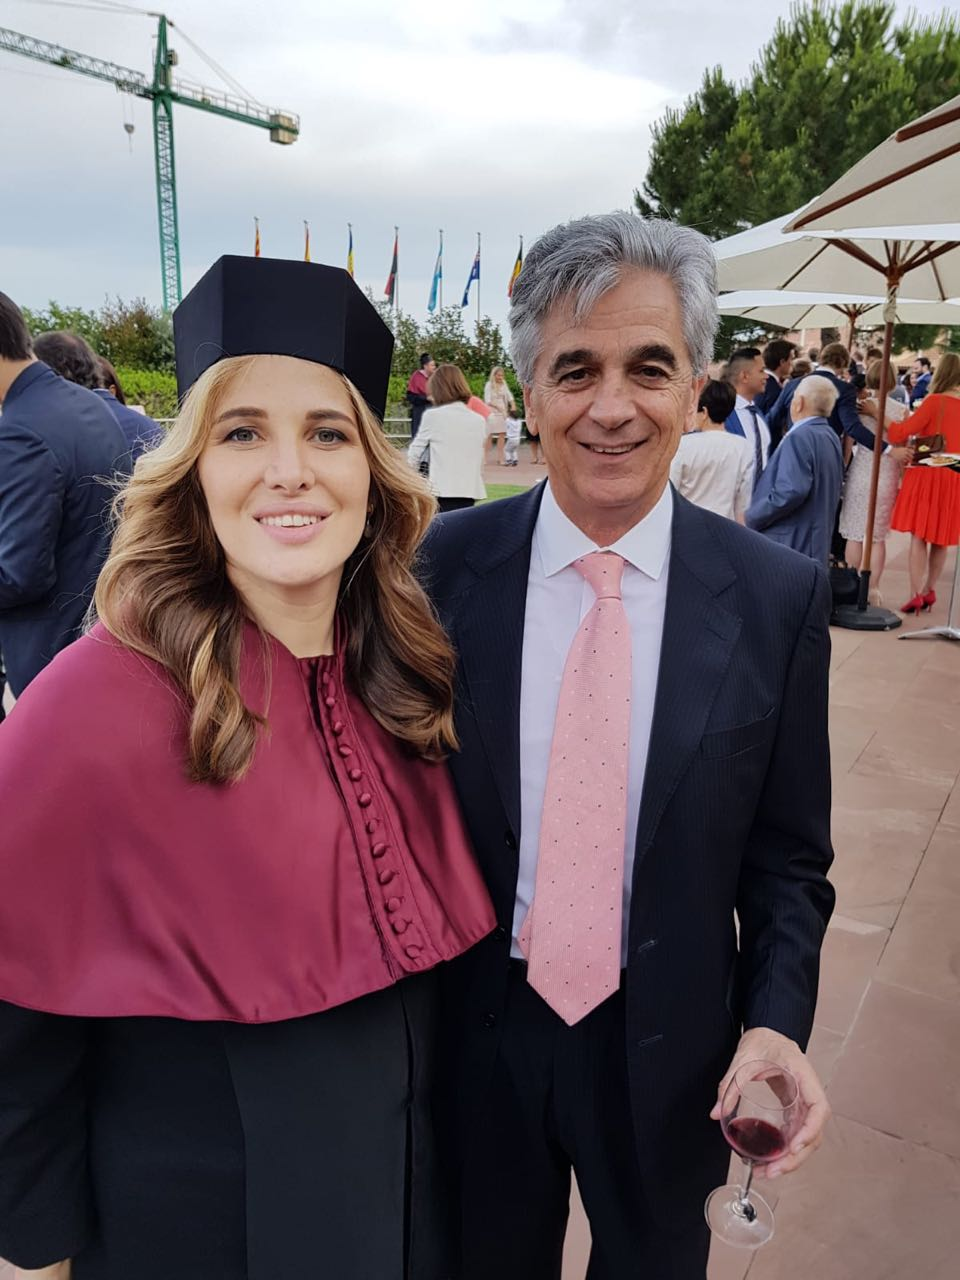 Inna Anisimova and Luis Canomanuel